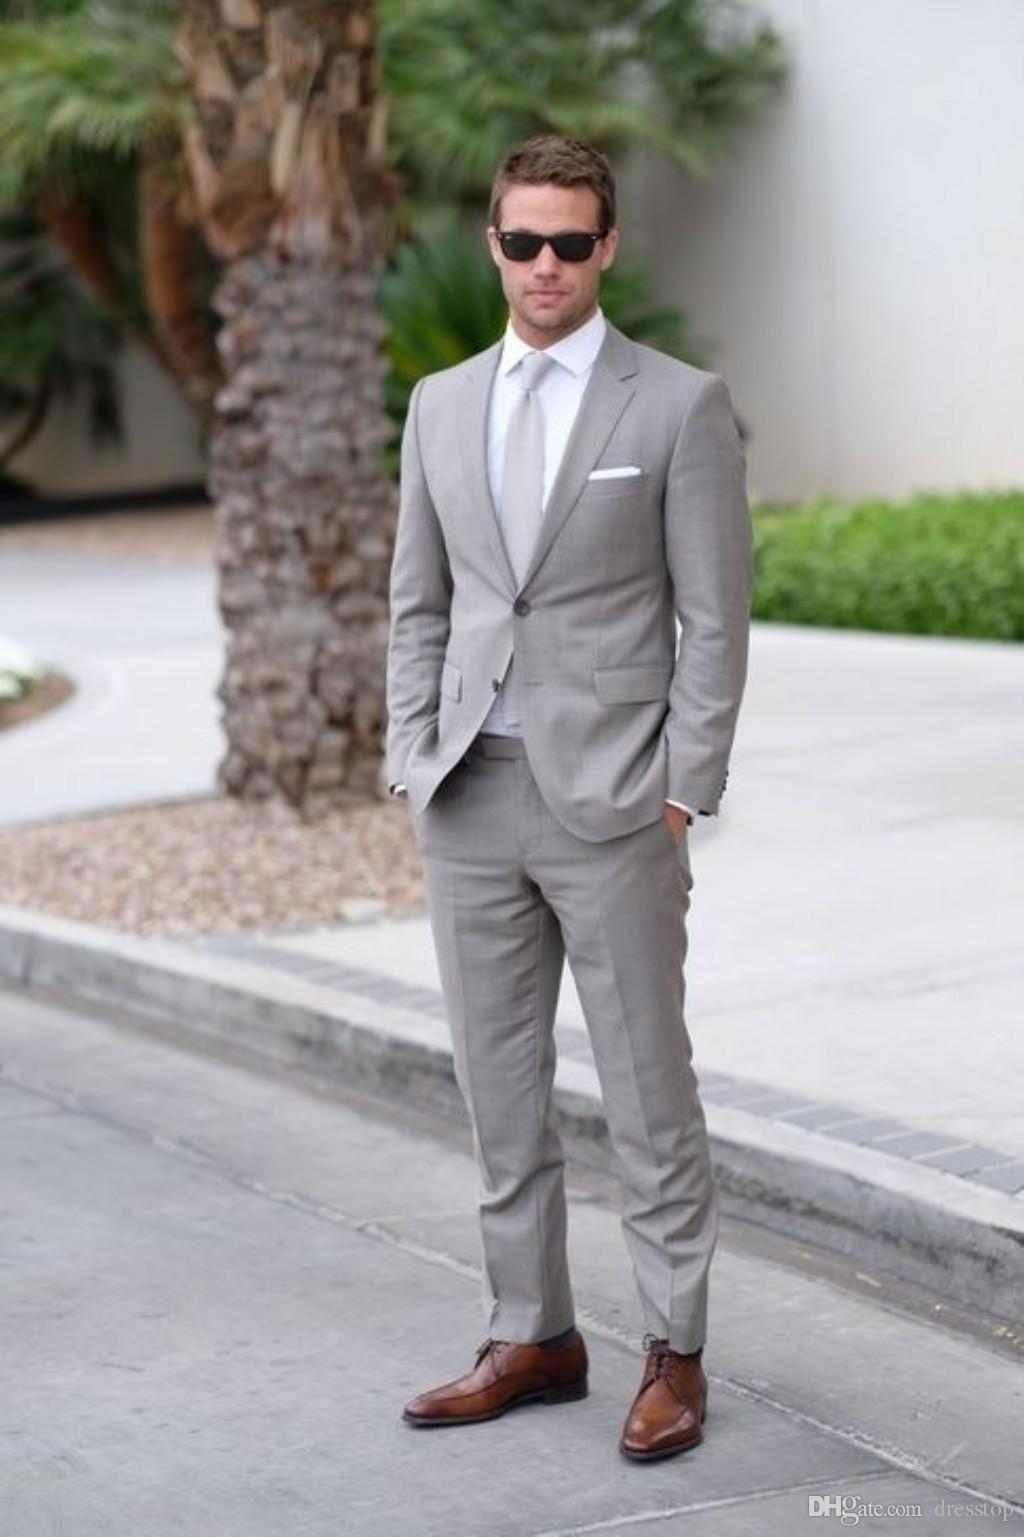 Pin von Guia estilo masculino auf Moda para homens | Pinterest